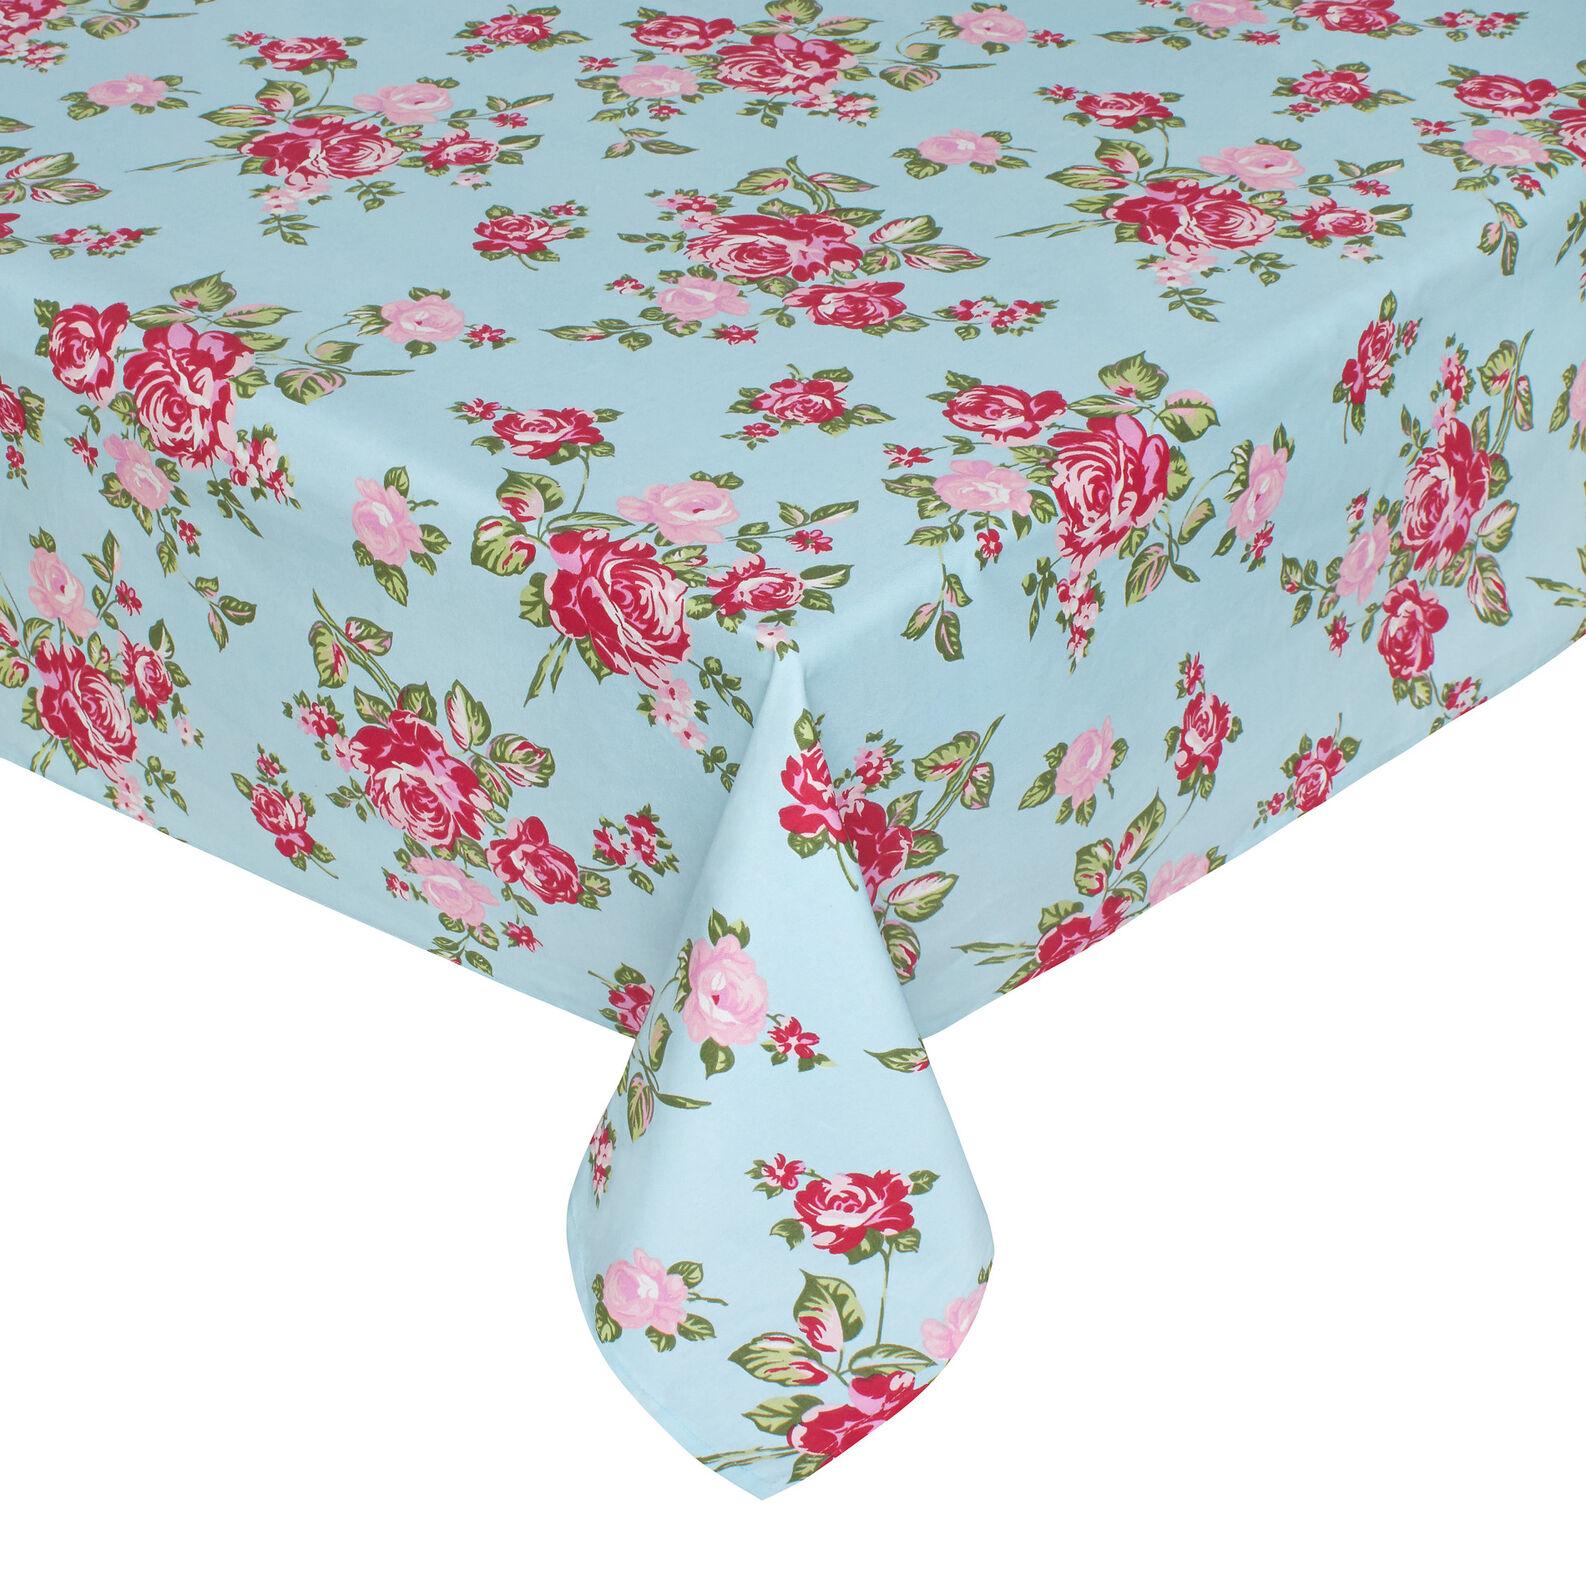 100 Cotton Tablecloth With Rose Floral Print Coincasa